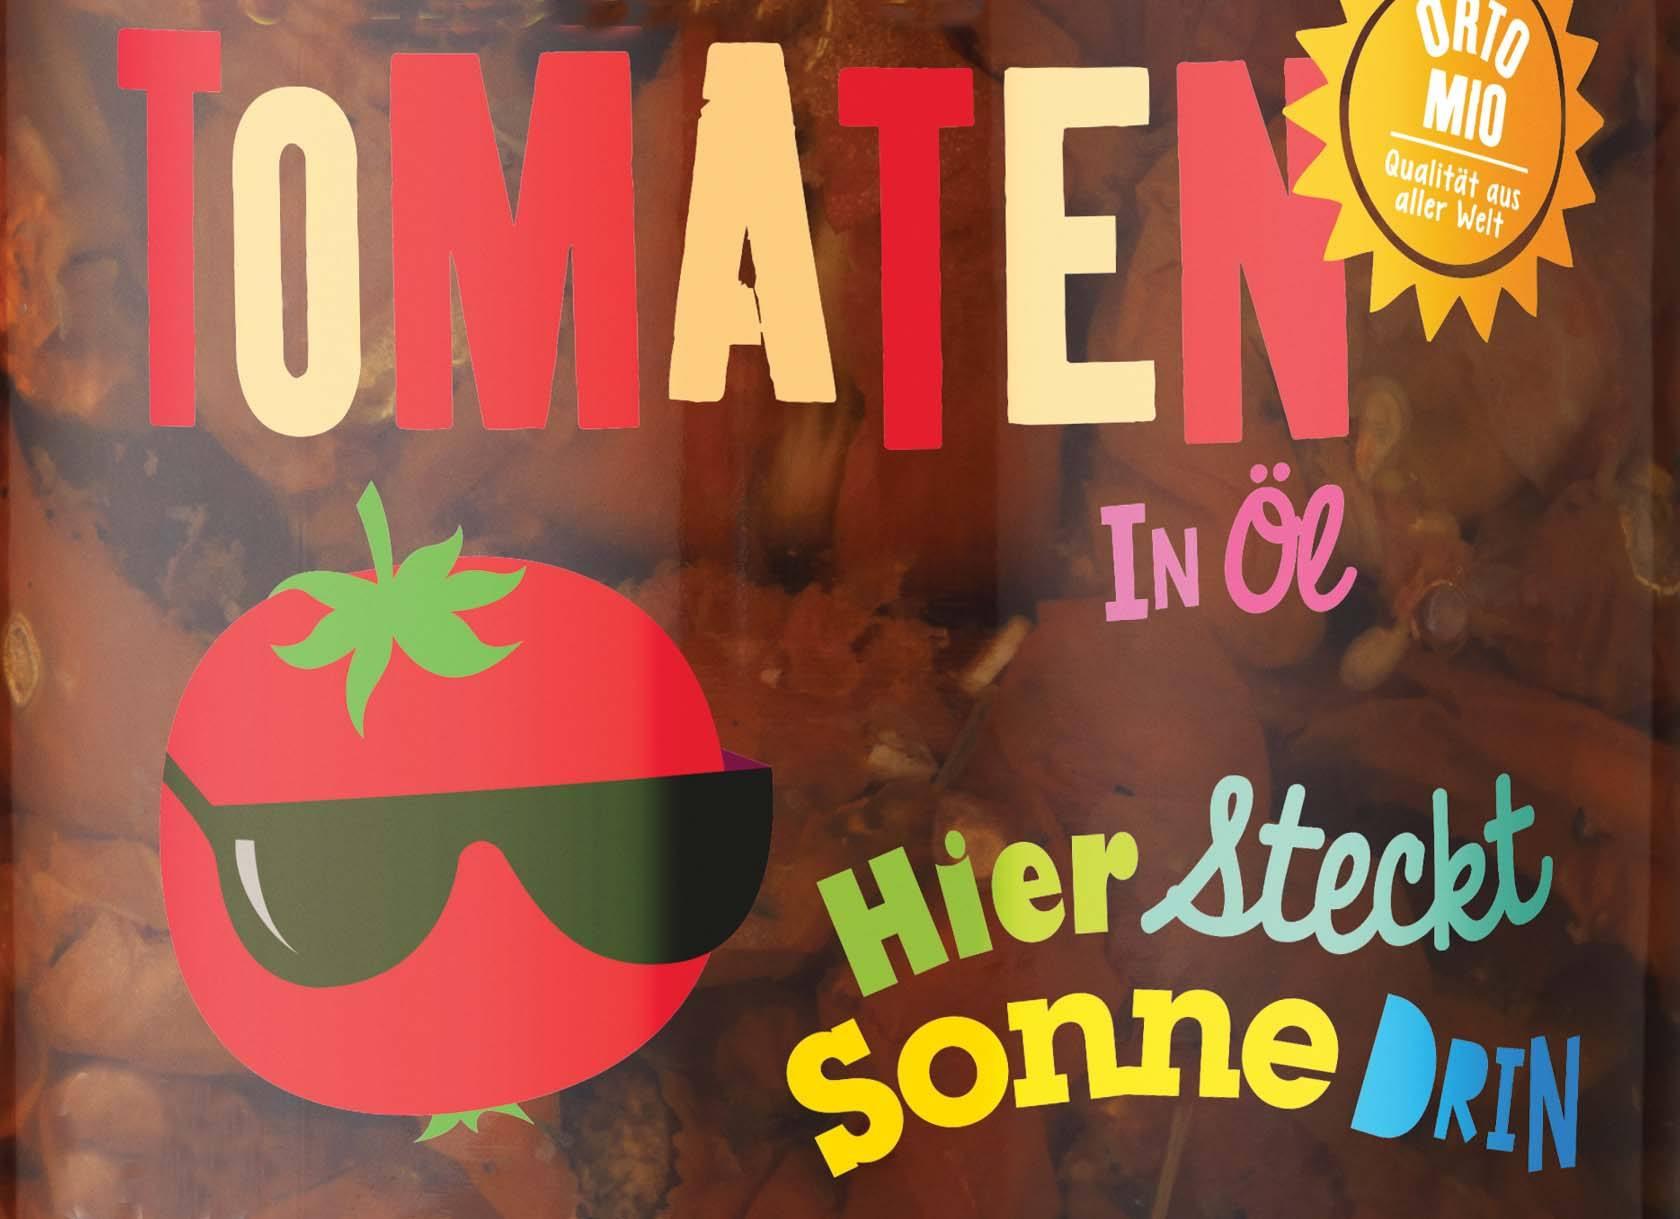 WMH-PENNY-ORTO-MIO-REWE-TOMATO-GRAPHICS-WEB image